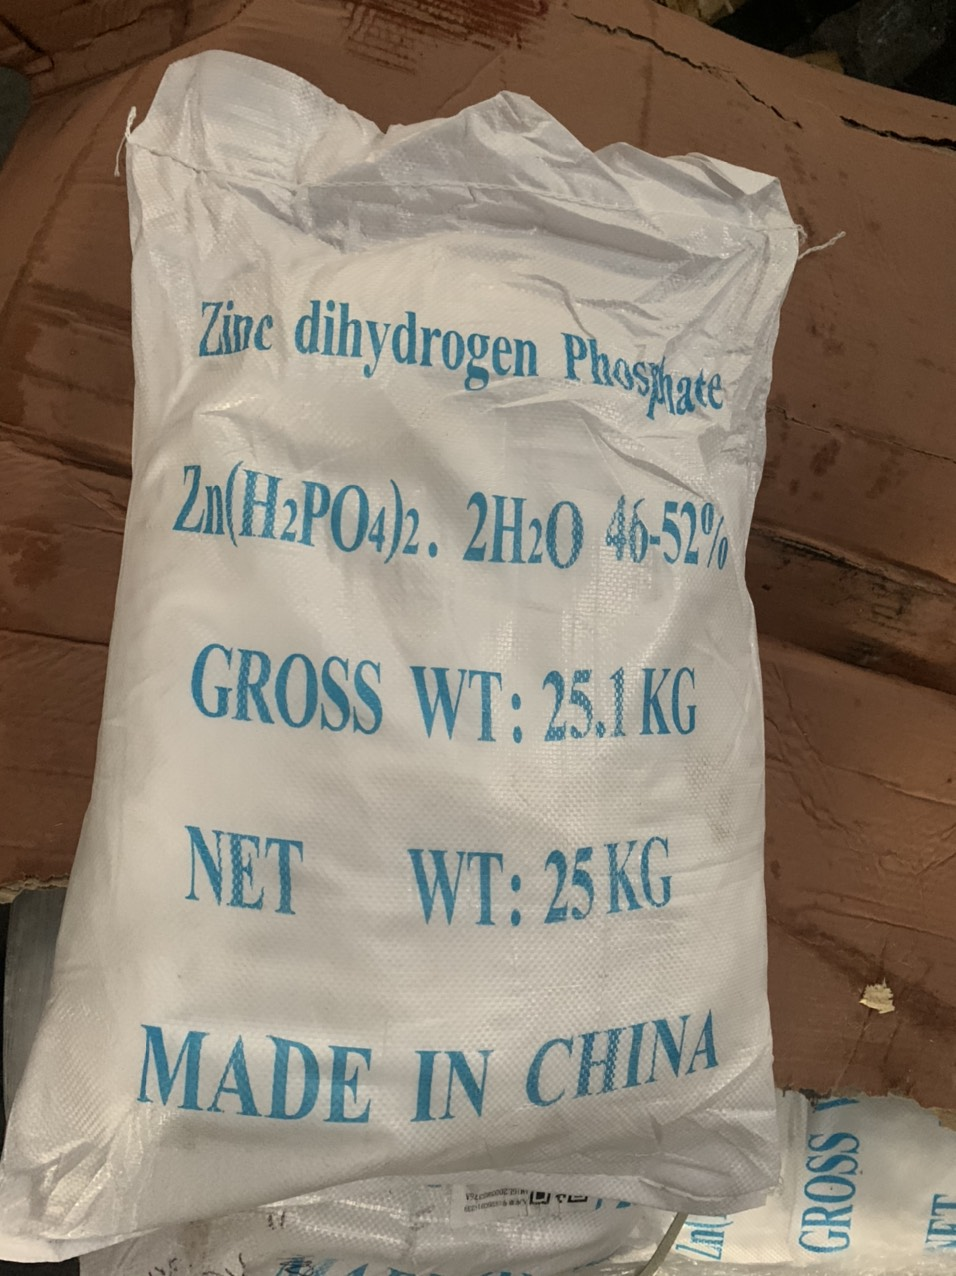 Zinc-dihydrogen Phosphate